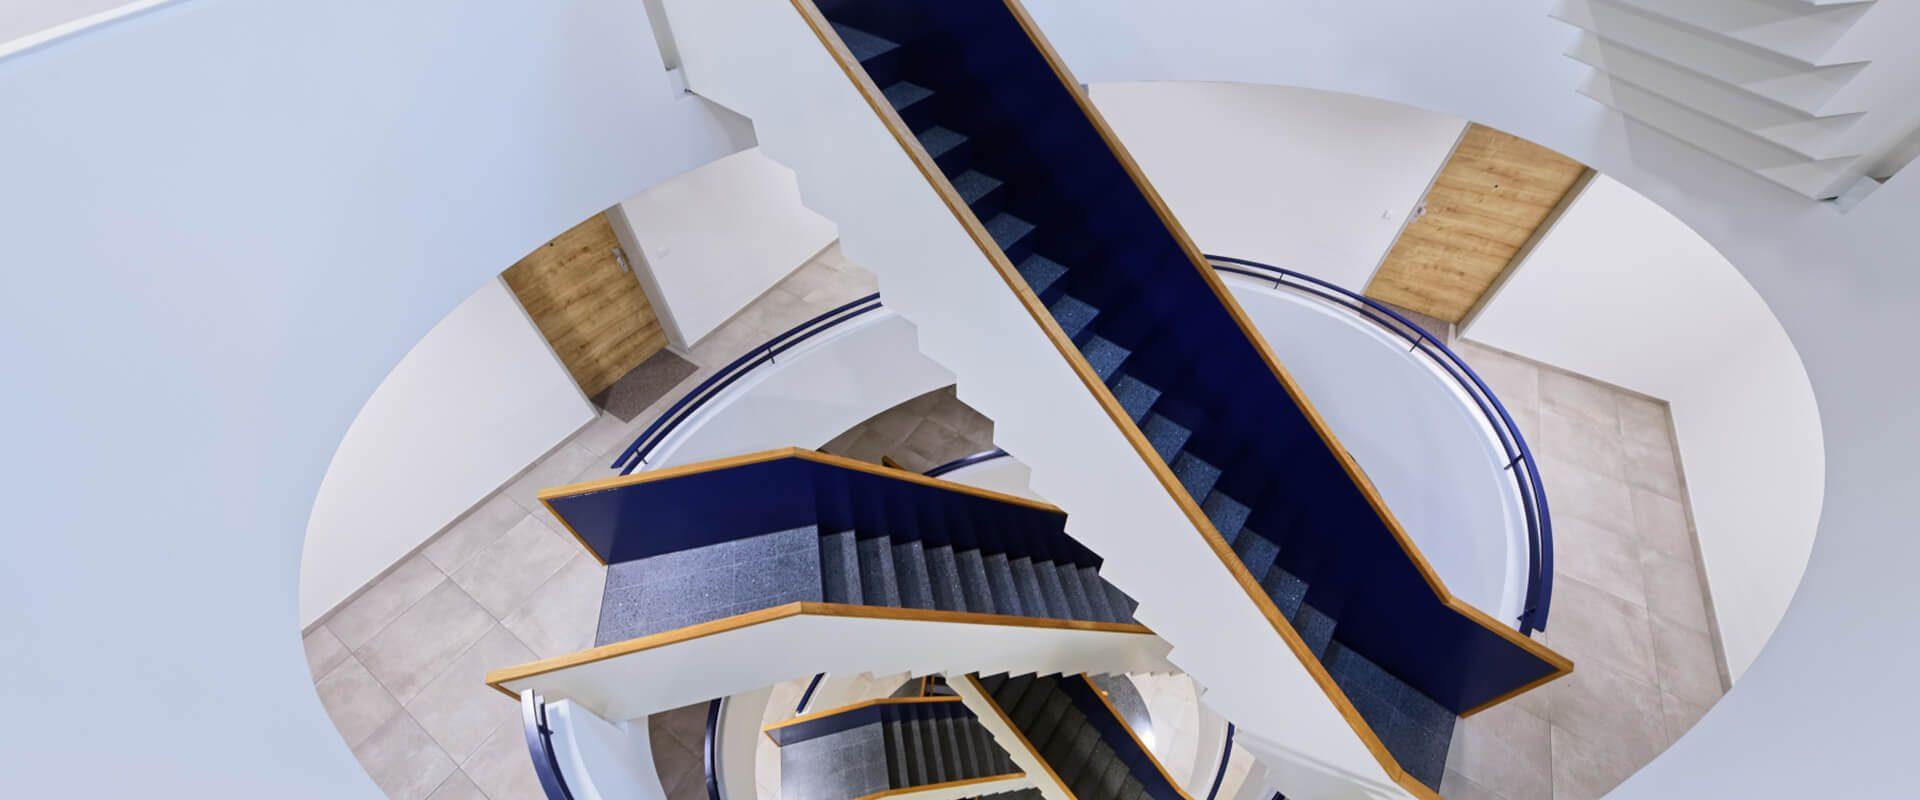 Haus-F-9164-BSP-Architekten-Kiel